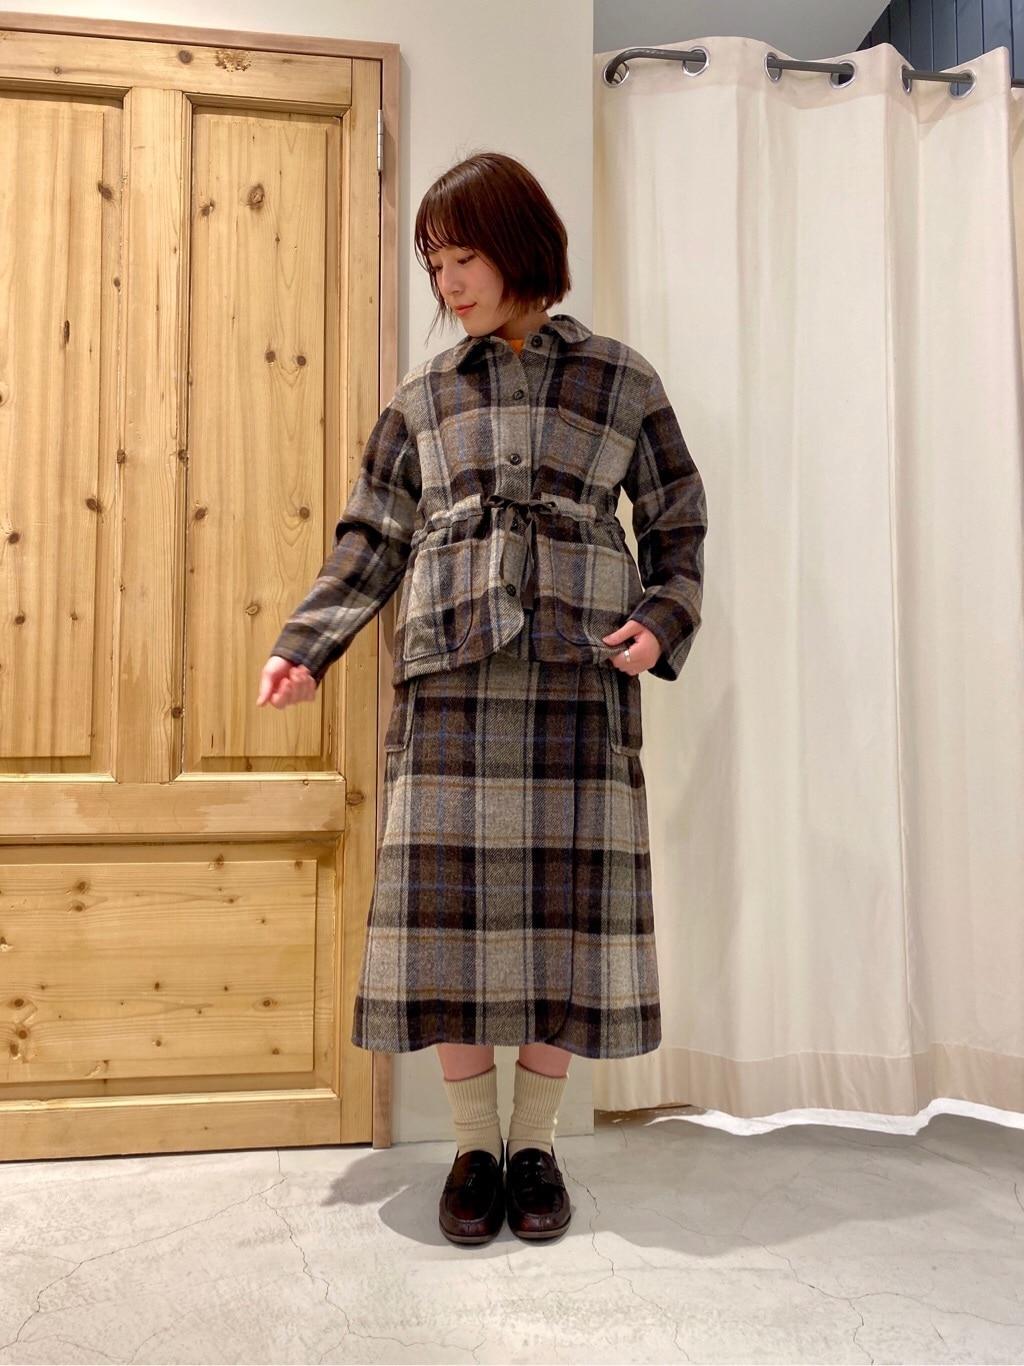 chambre de charme キラリナ京王吉祥寺 身長:160cm 2019.12.04